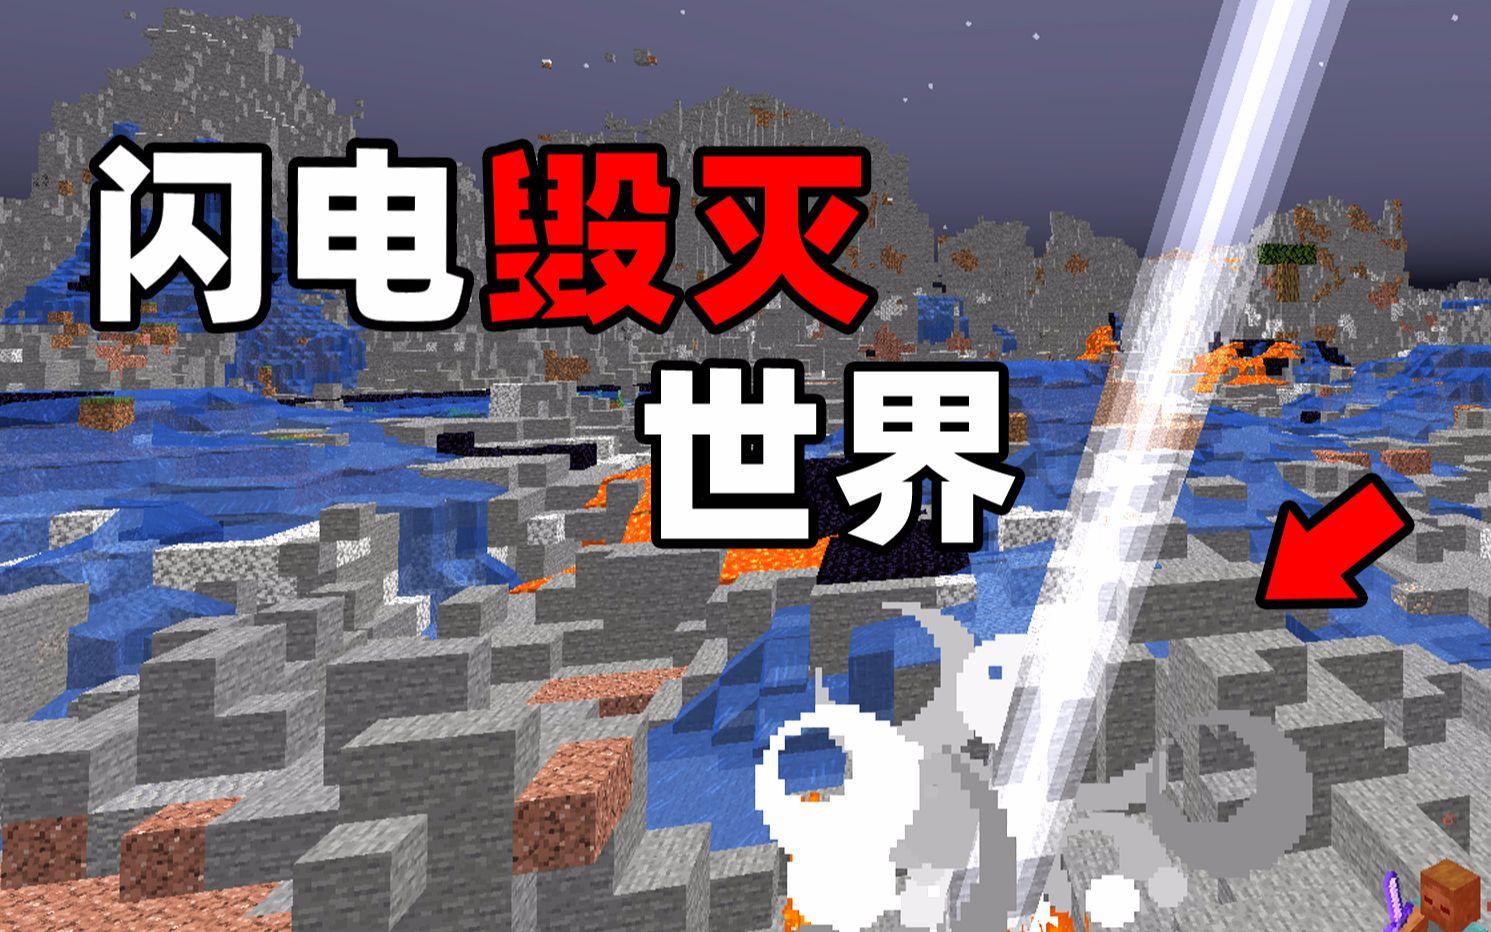 MC当闪电开始毁灭这个世界时!你该怎么生存下去?我的世界Minecraft!